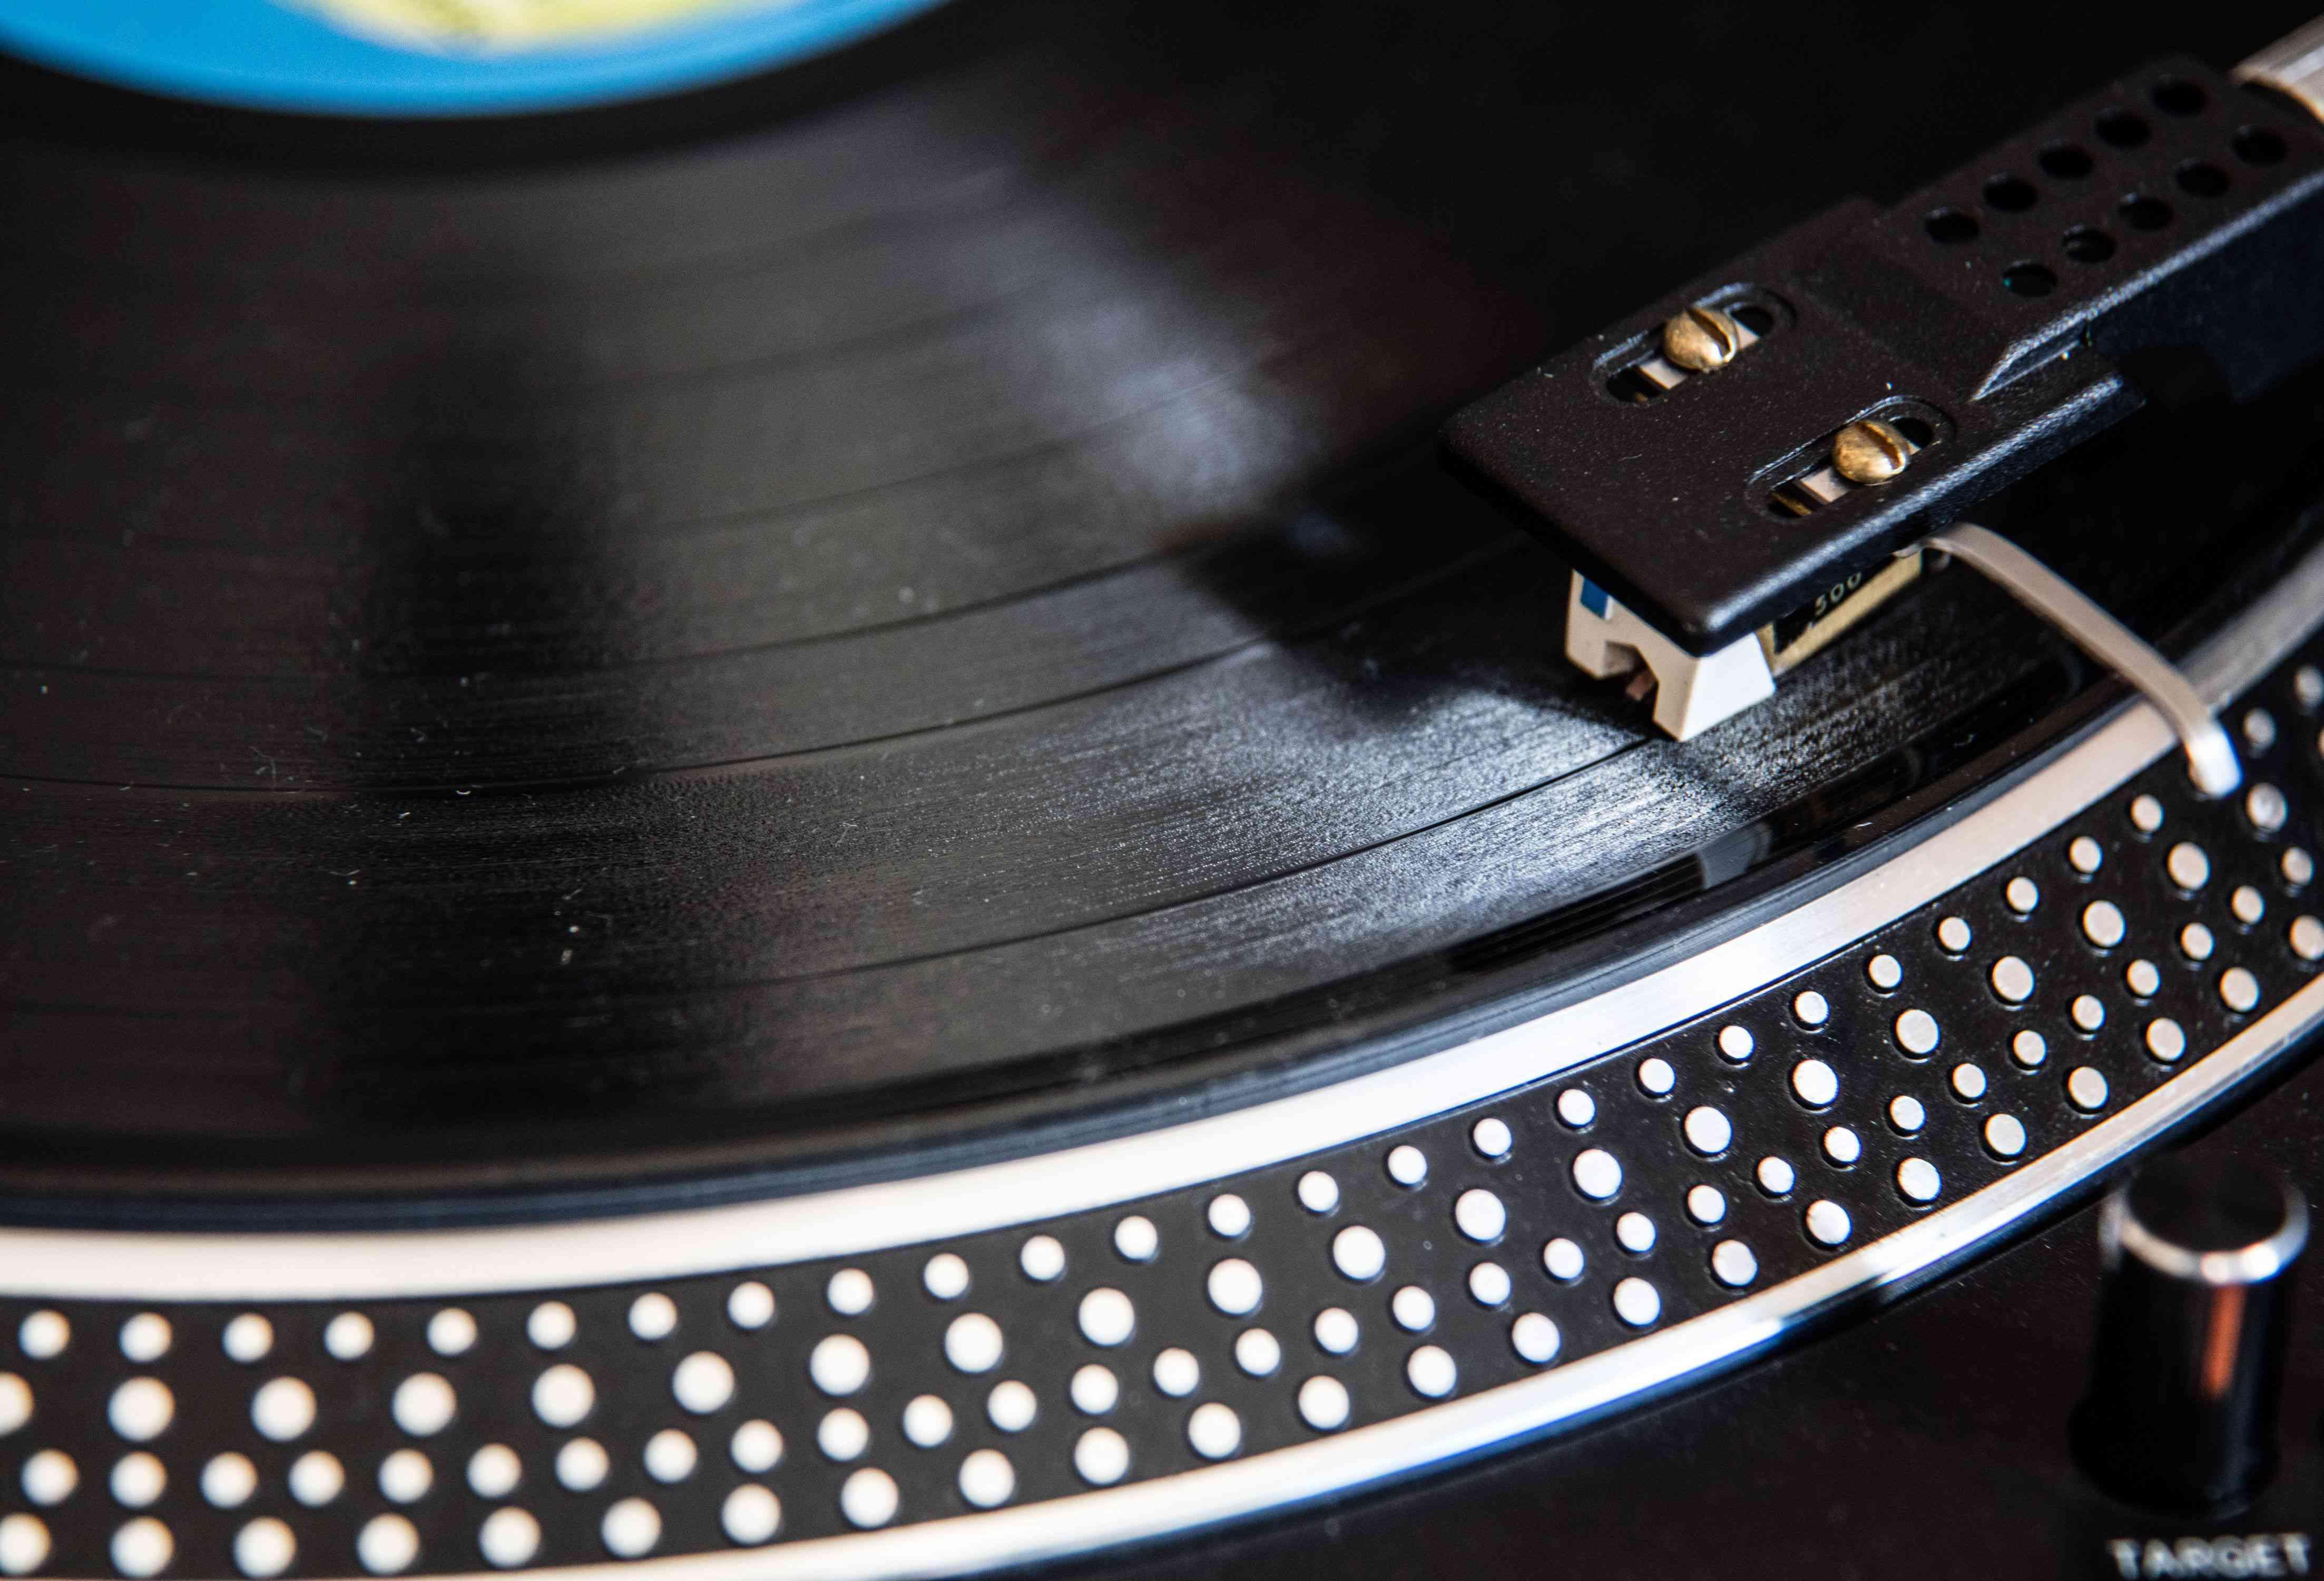 A vinyl LP on a turntable